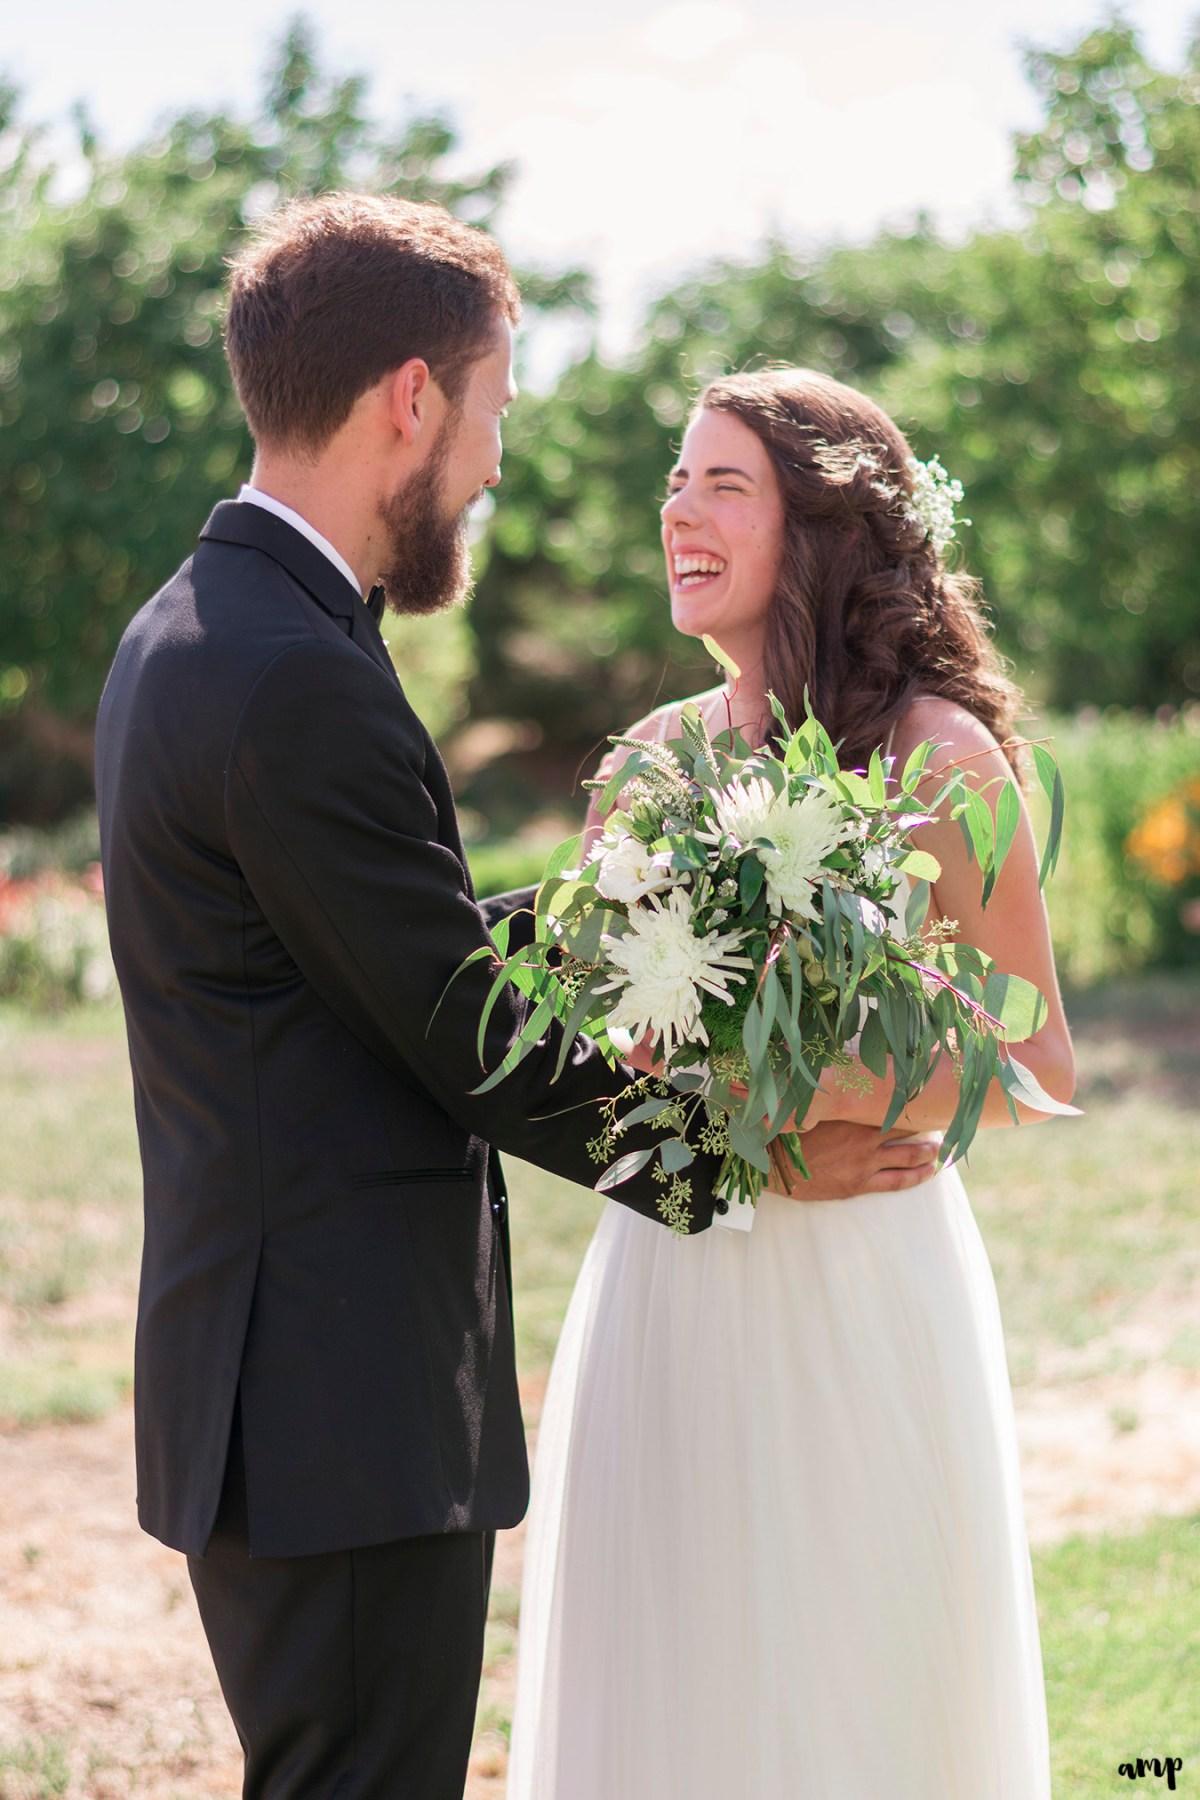 Those just married giddy feels between bride and groom